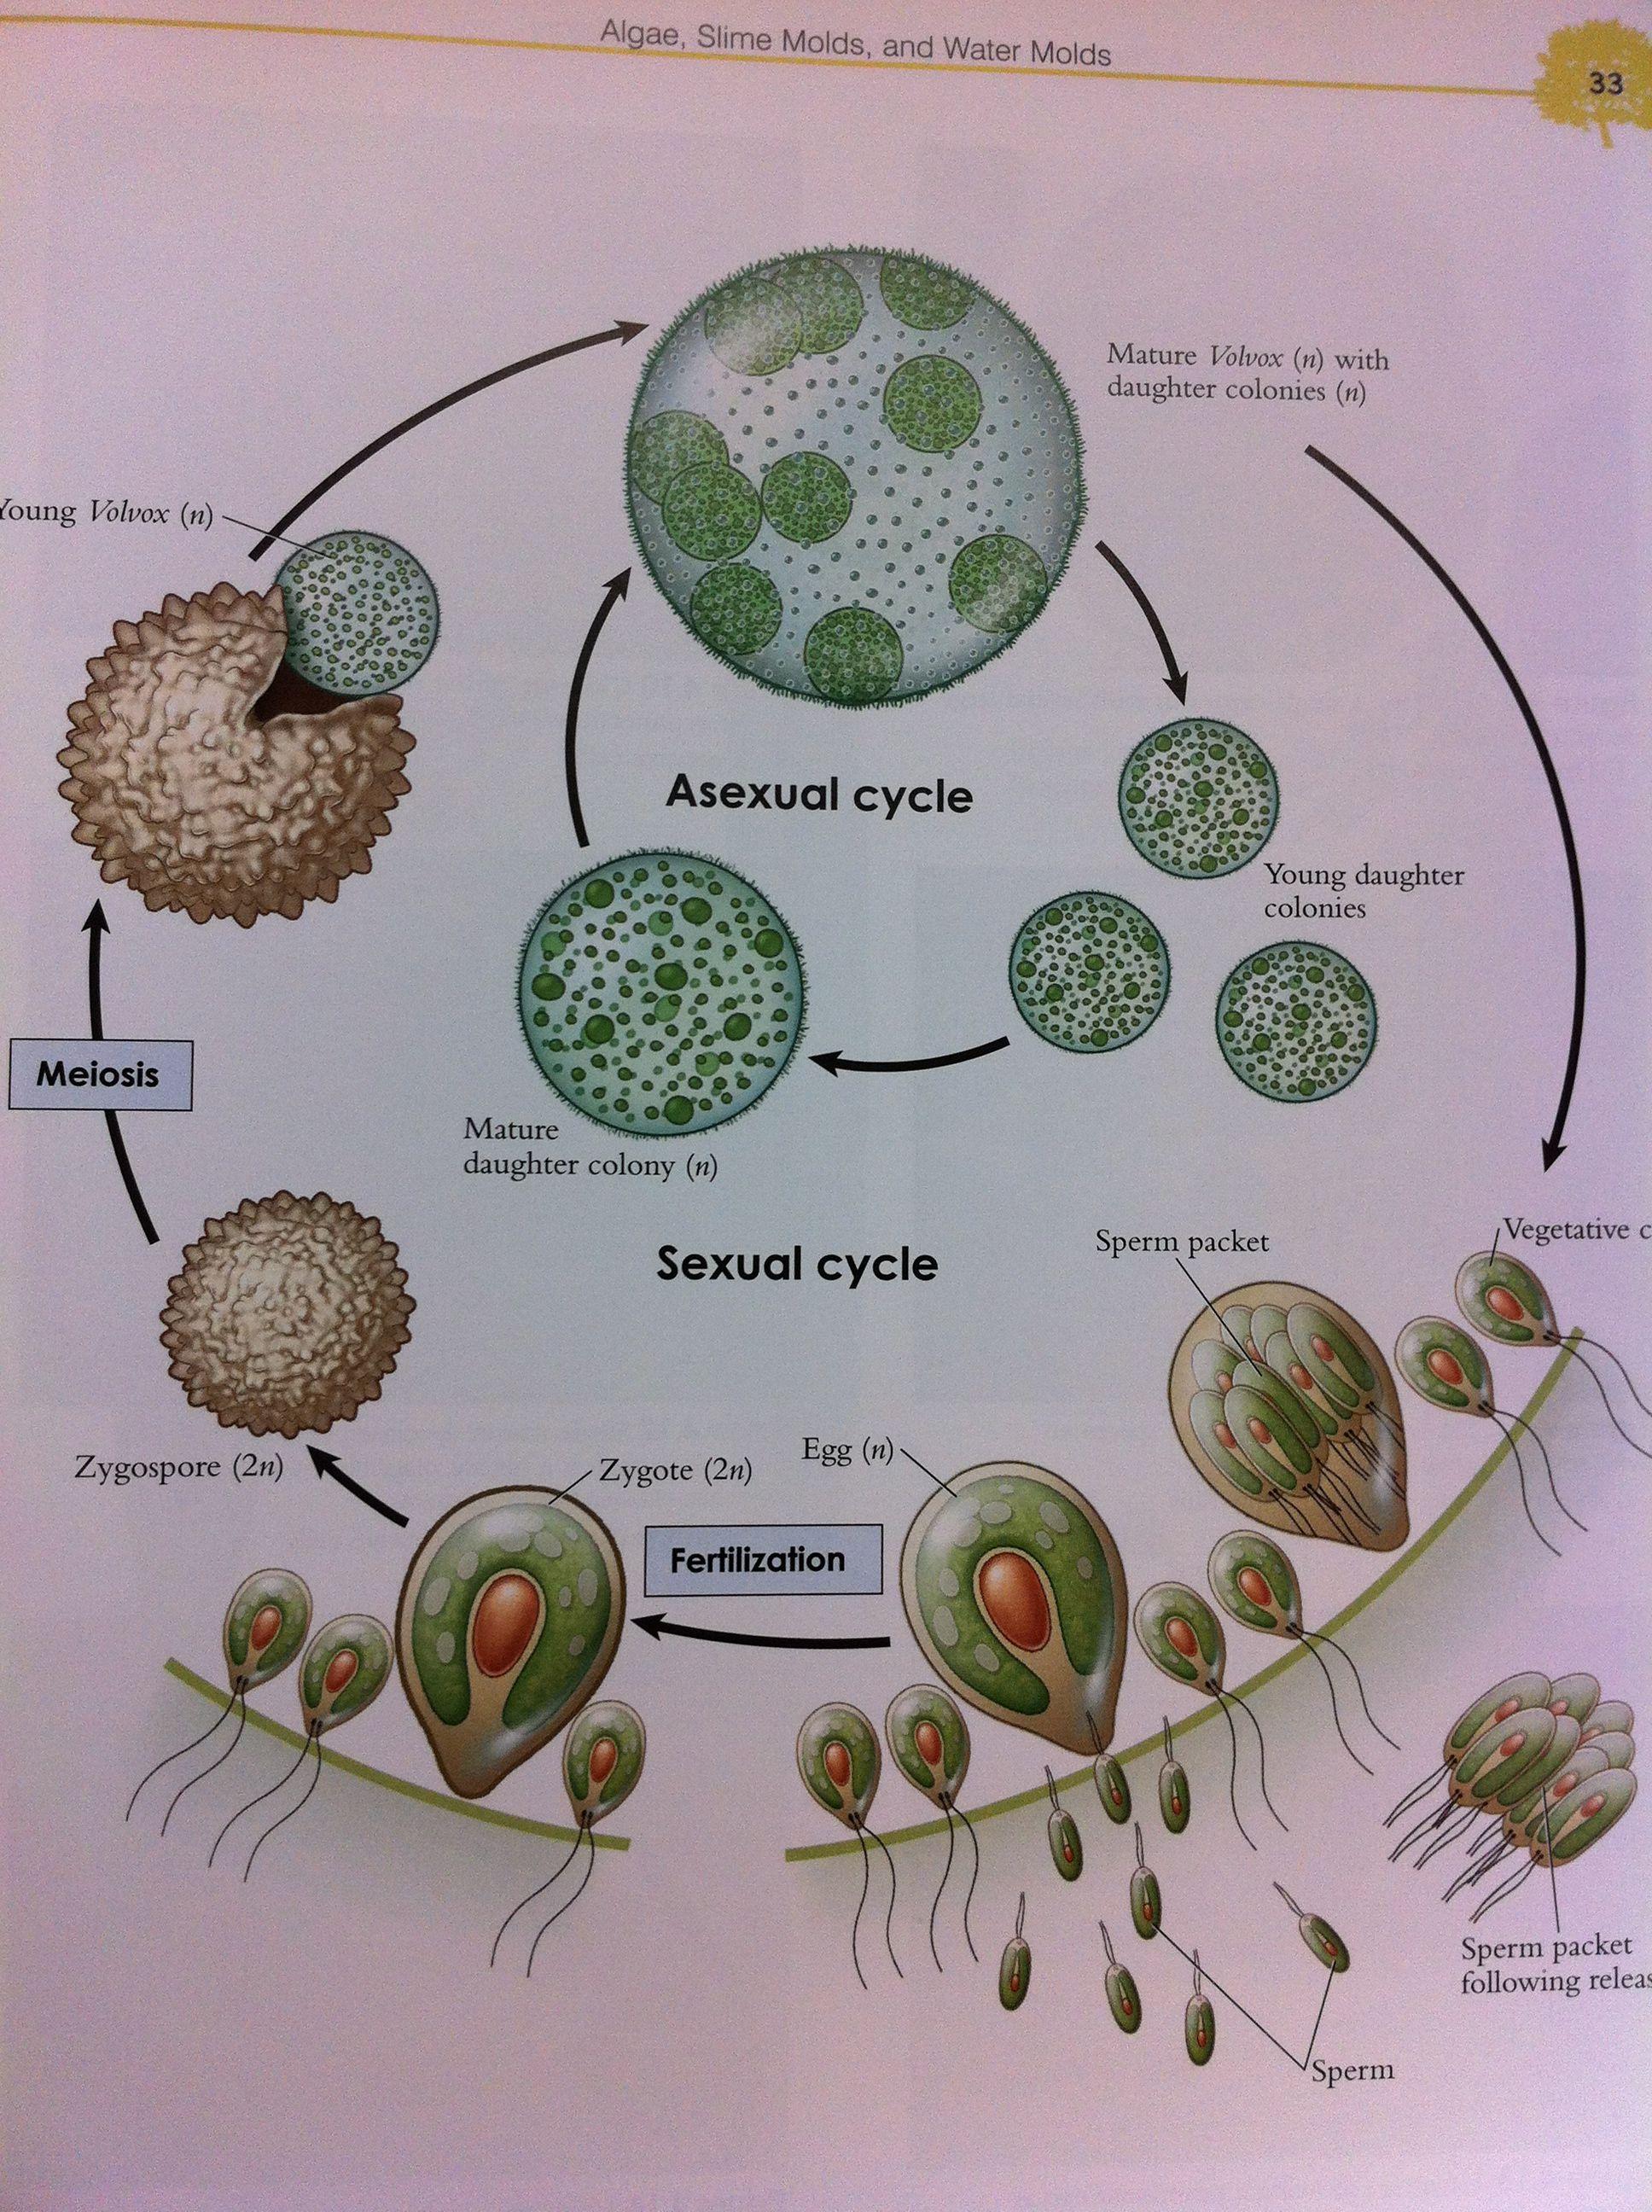 medium resolution of volvox green algae reproduction cycle